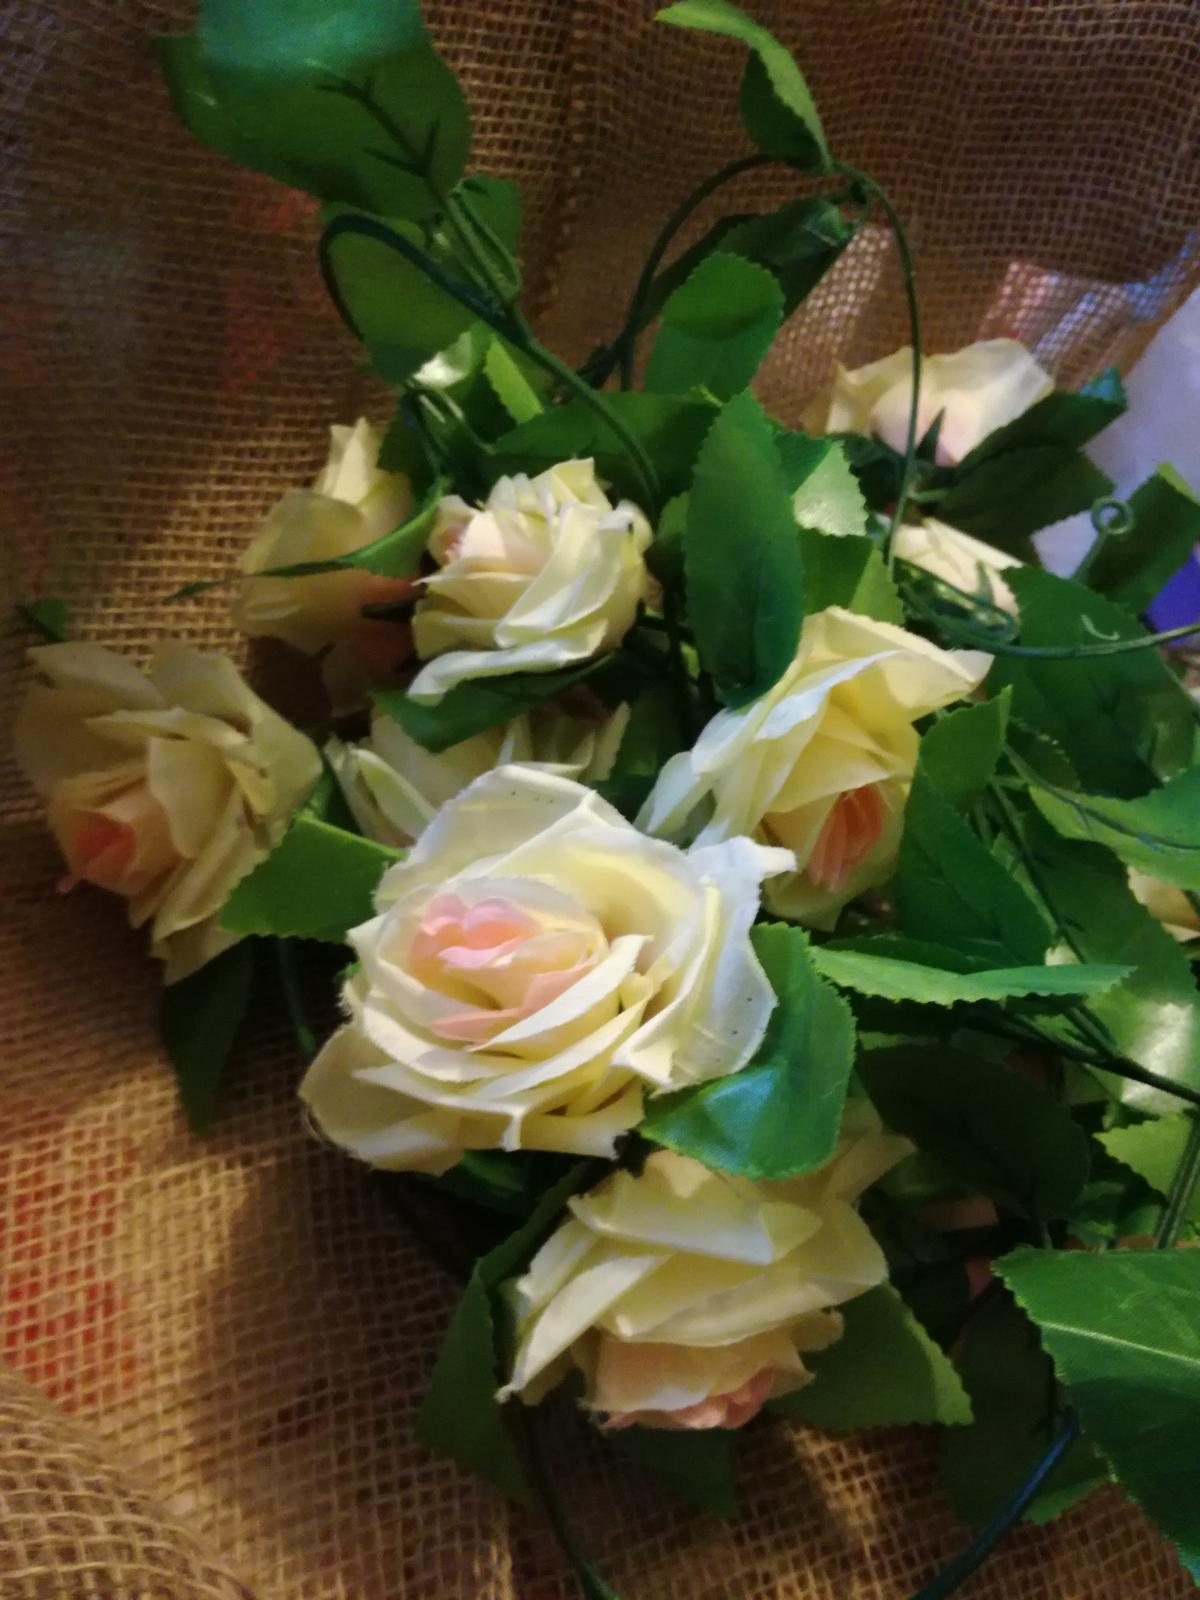 Dekorace s ružemi - Obrázek č. 1